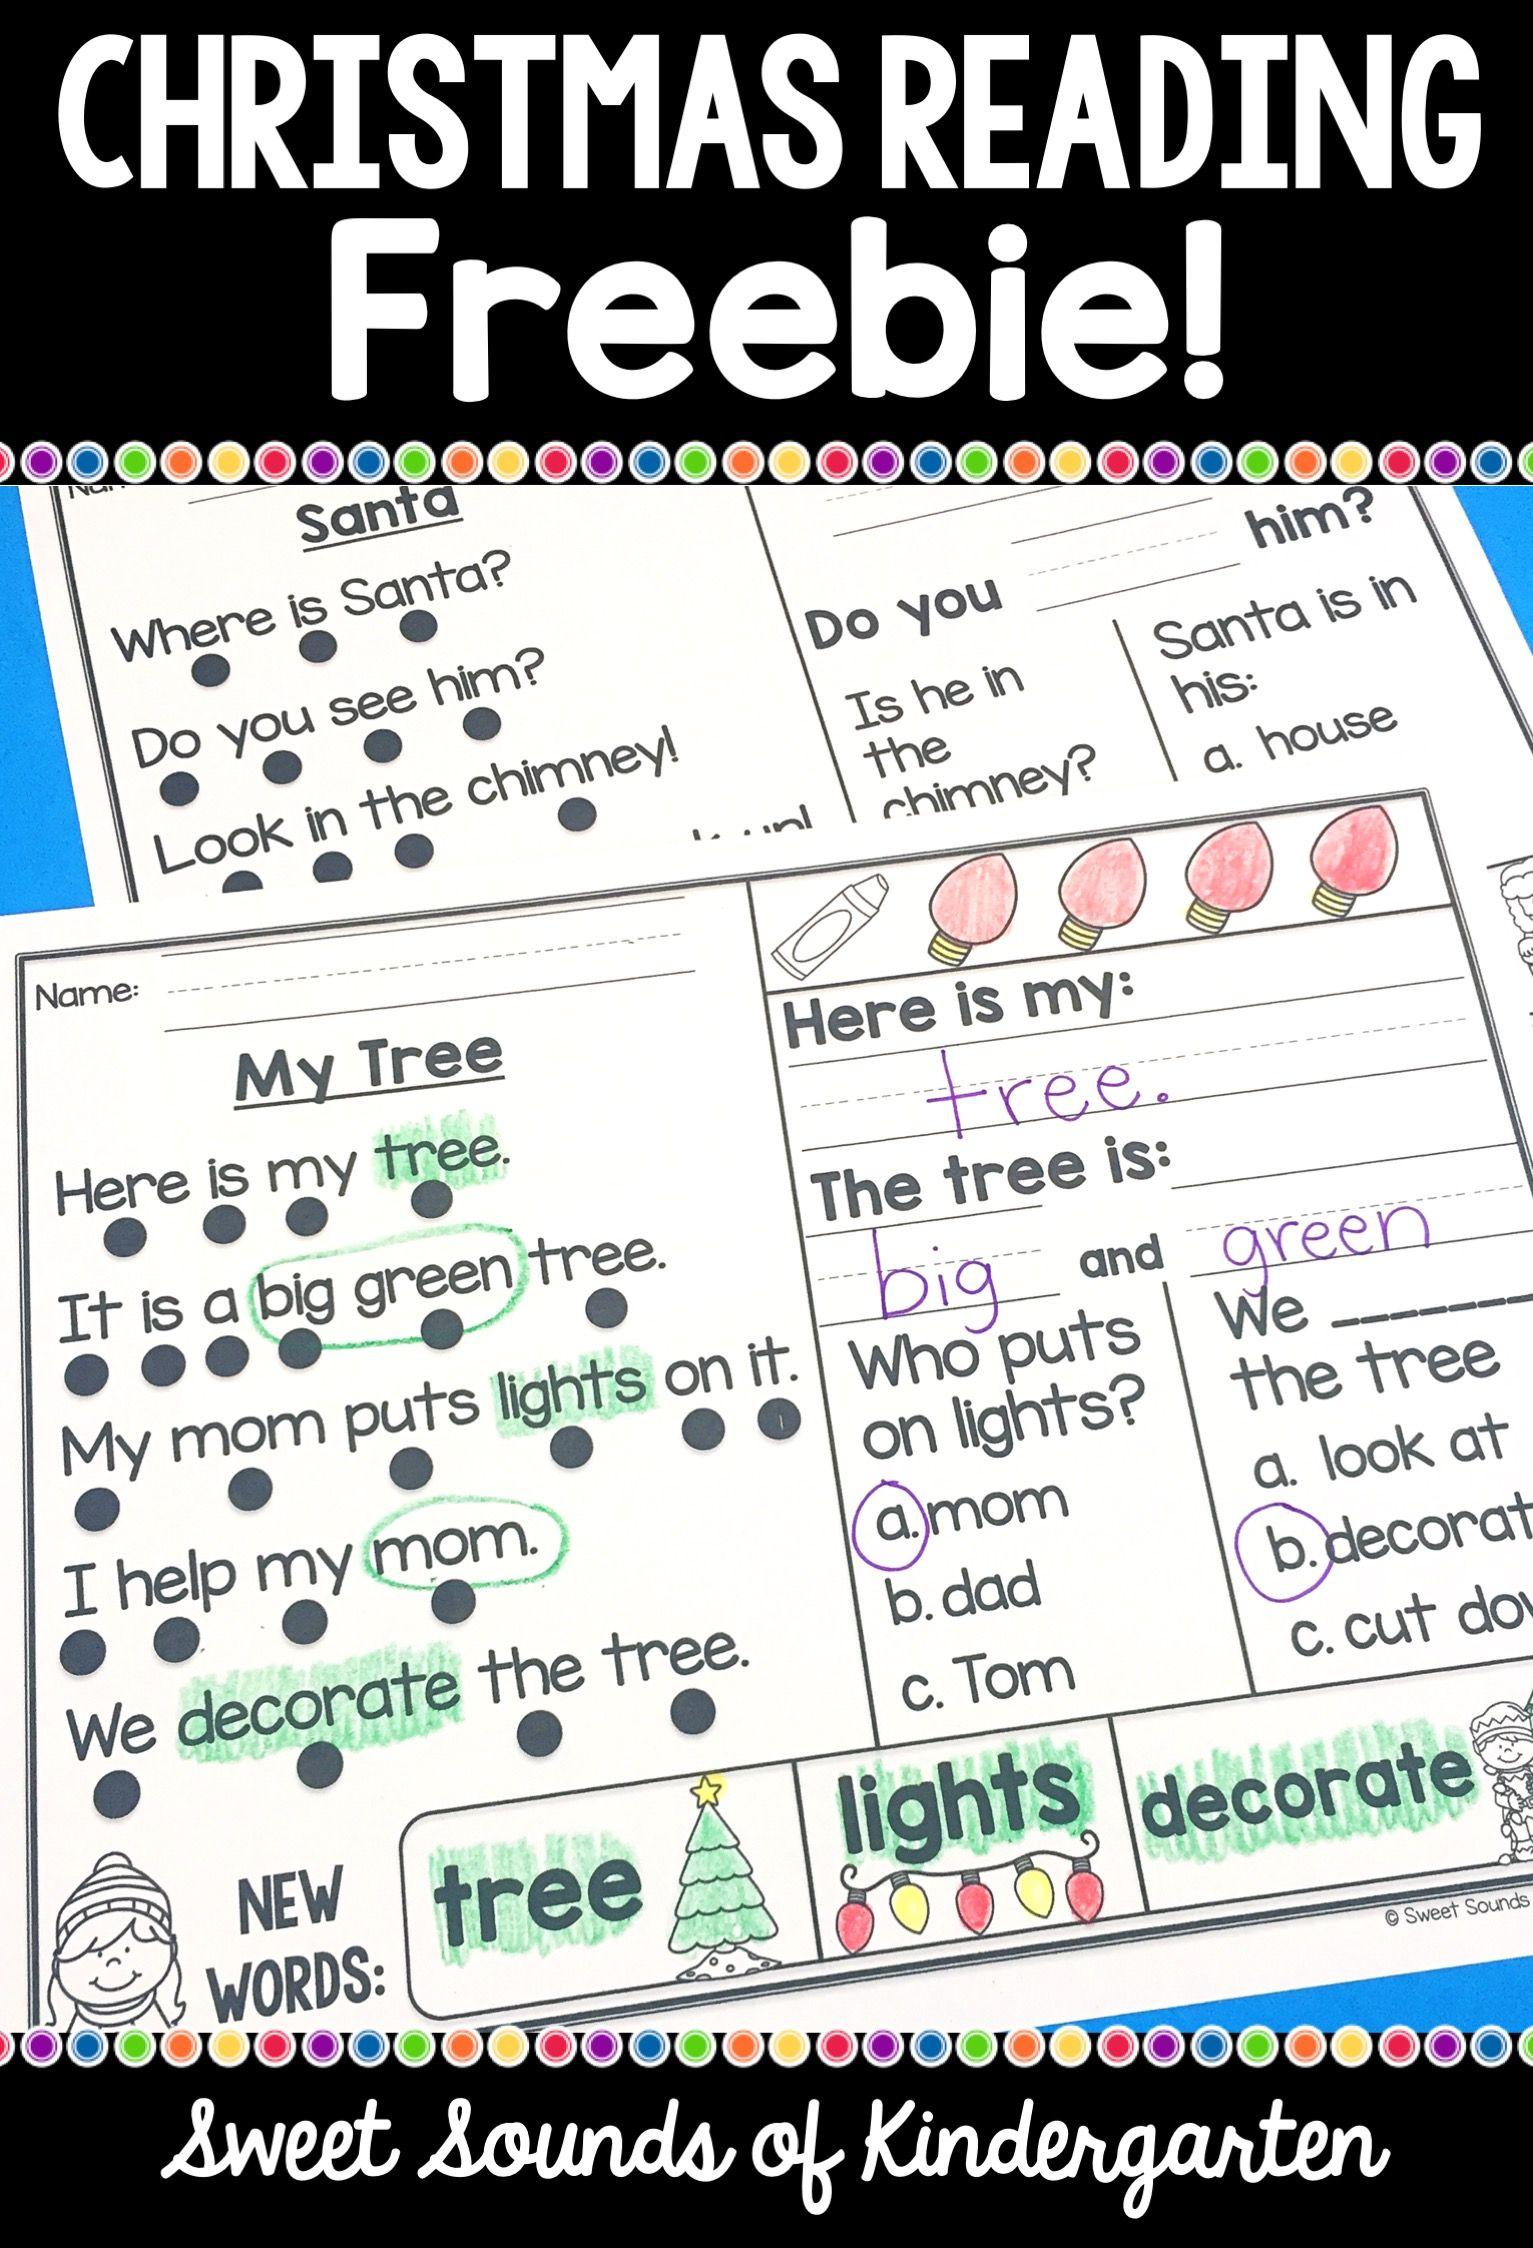 Kindergarten Reading Comprehension Passages Christmas Freebie Christmas Reading Passages Reading Comprehension Kindergarten Reading Comprehension Passages [ 2248 x 1533 Pixel ]